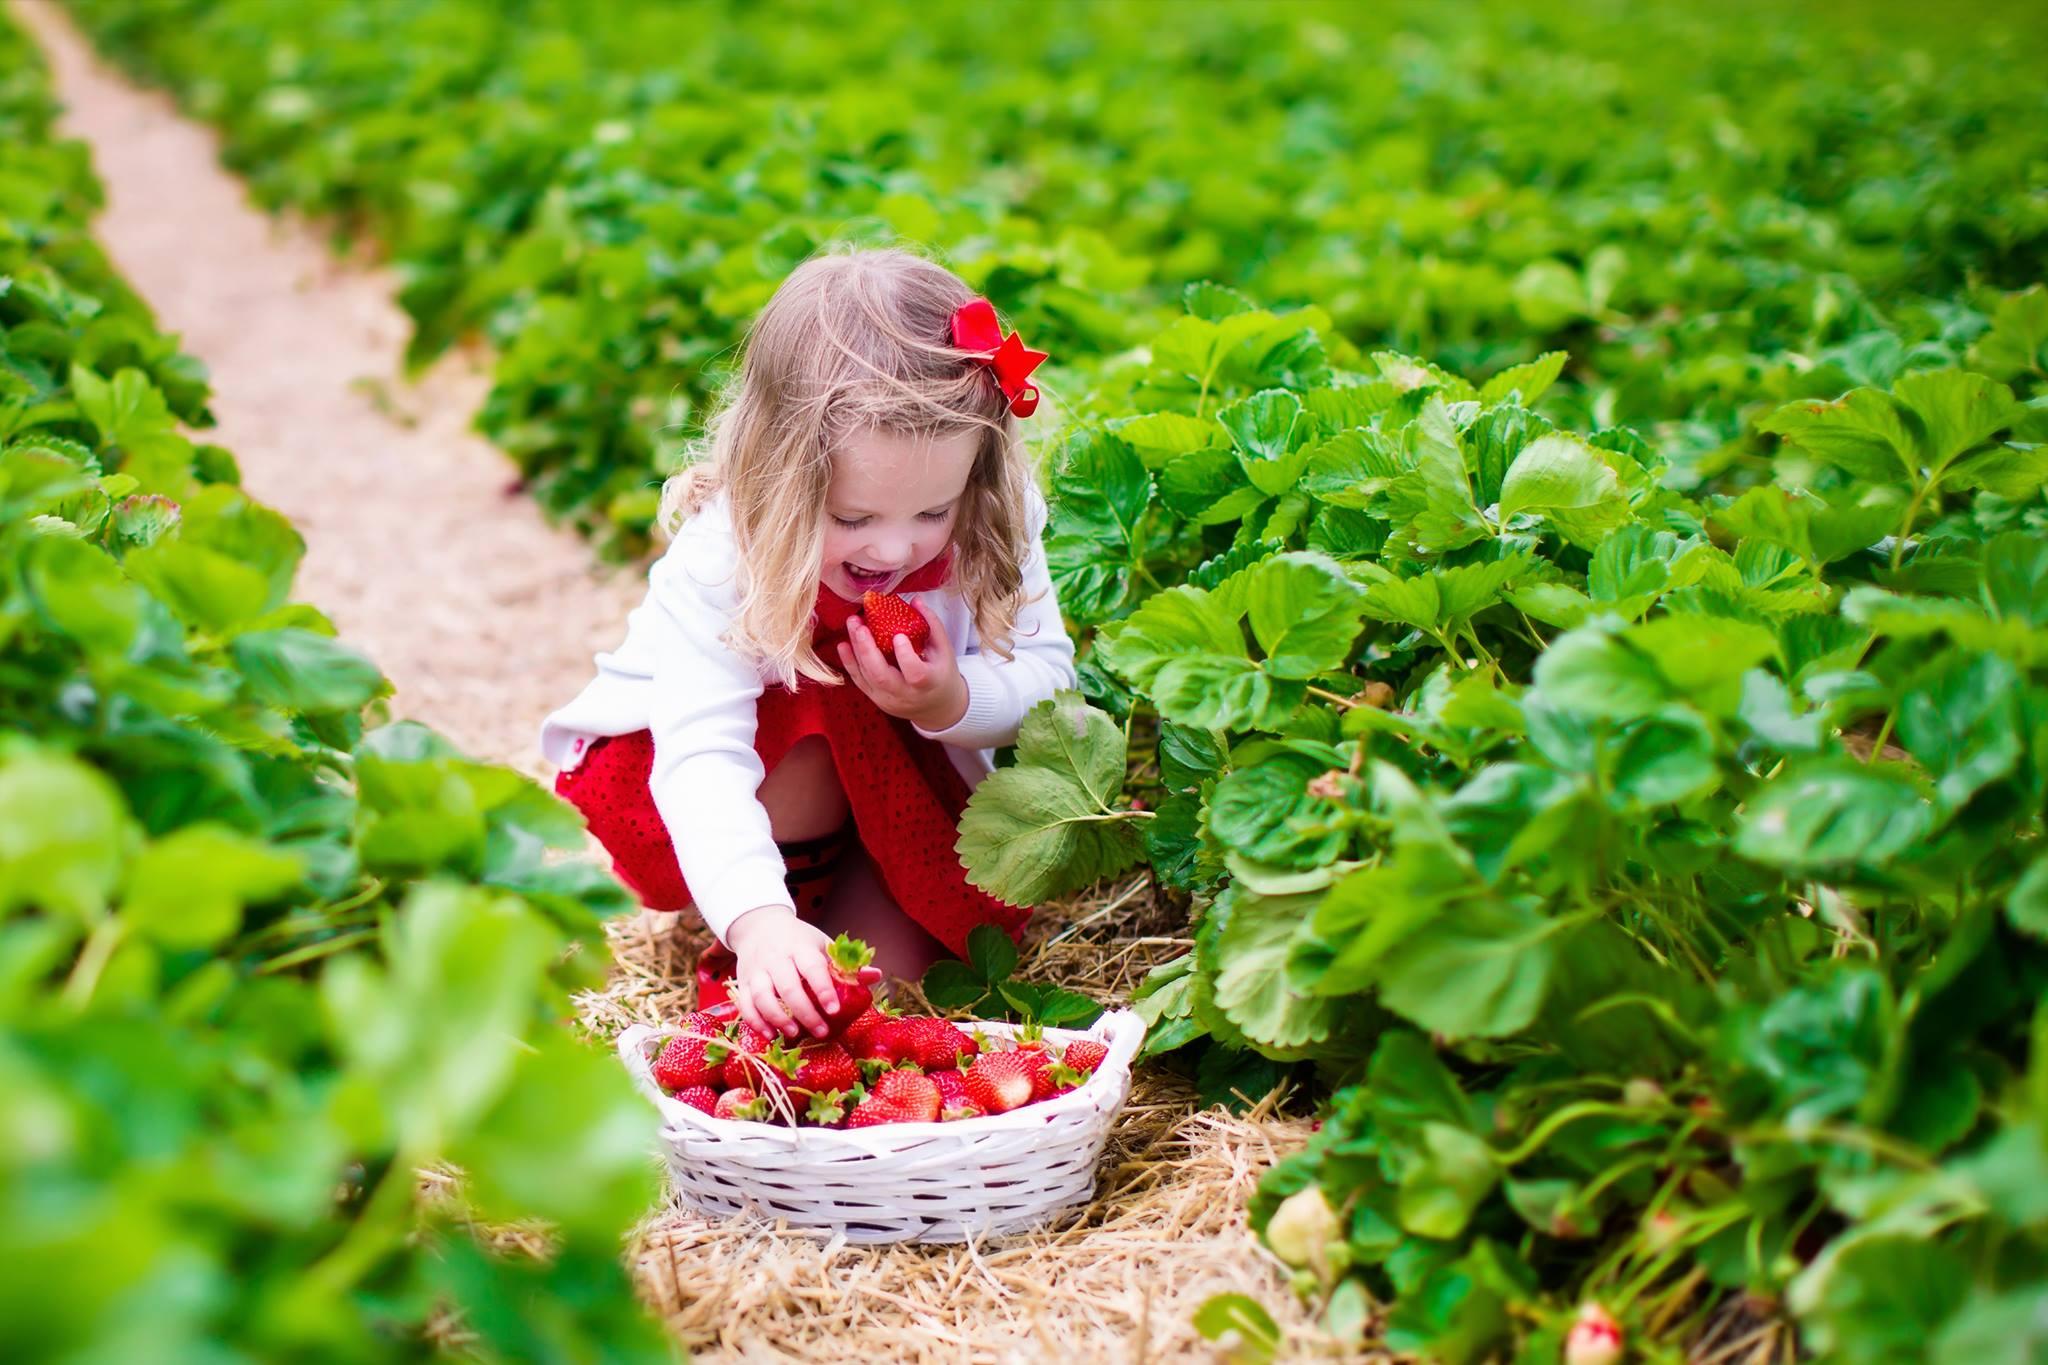 lyman orchards strawberry festival.jpg